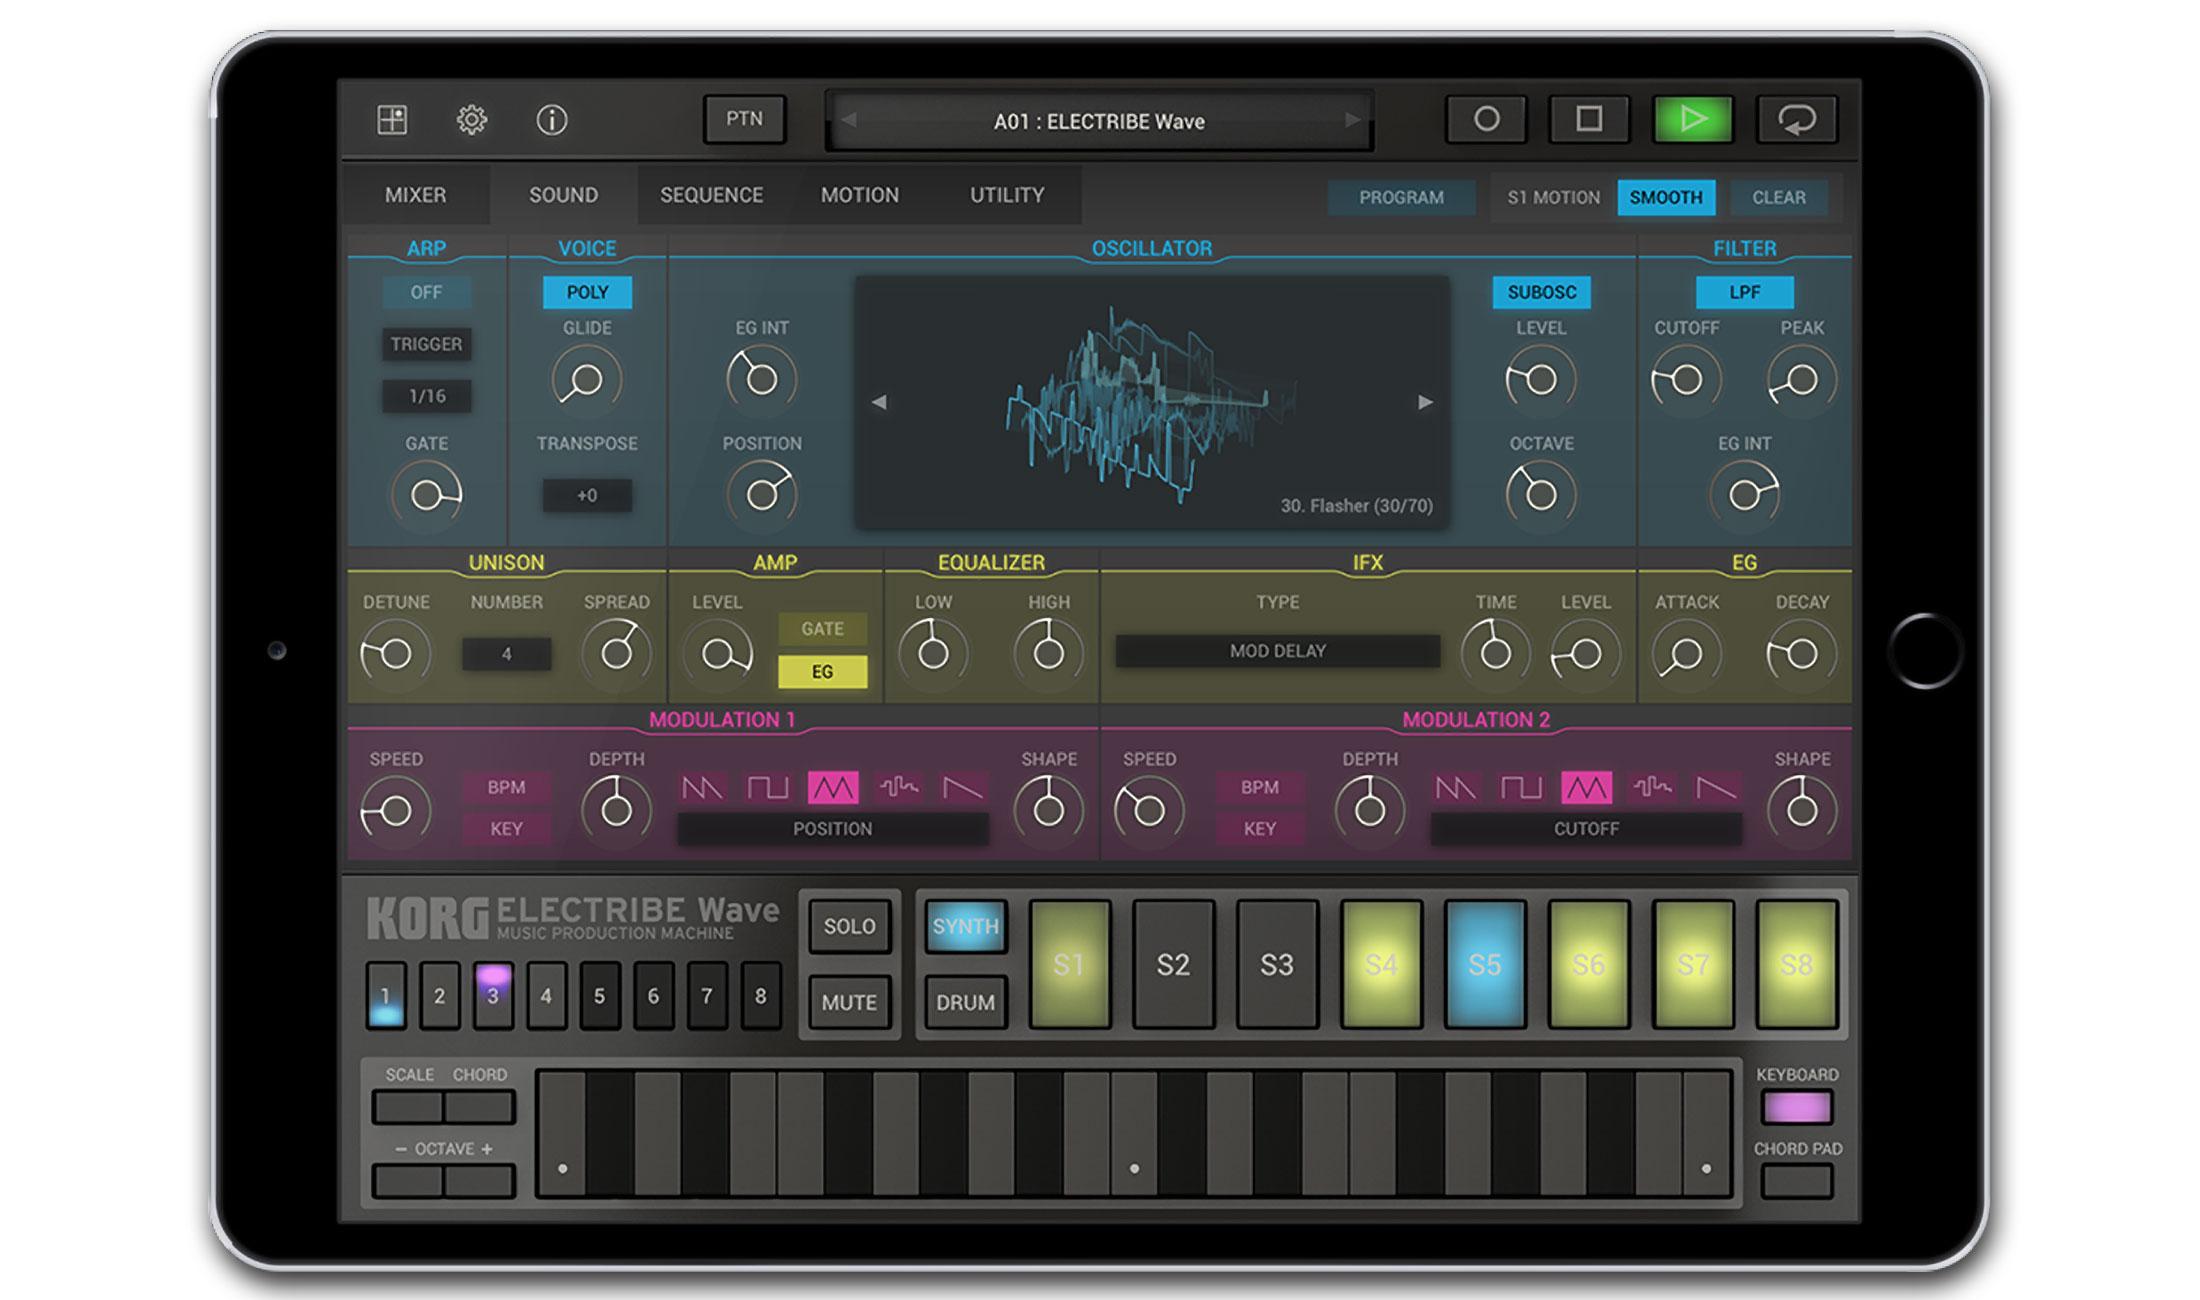 Korg Electribe Wave mit Wavetable-Synthese fürs iPad